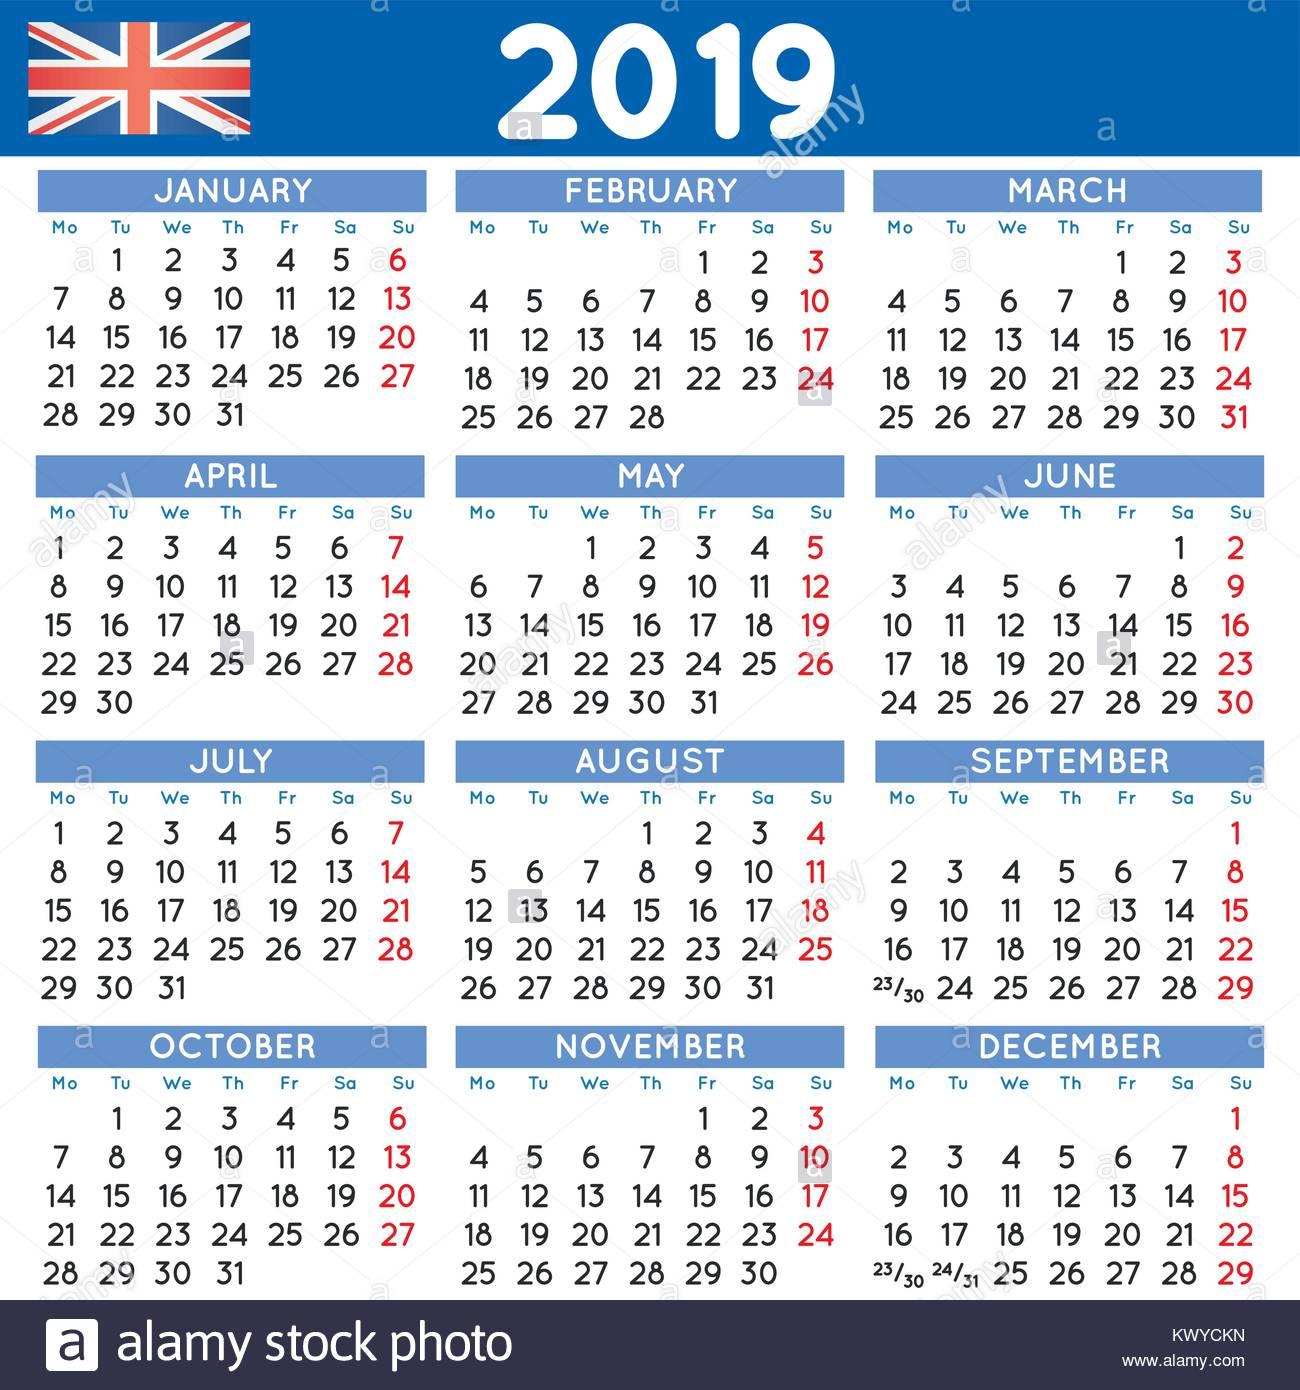 Calendario Settimane Anno 2019.2019 Elegante Calendario Squadrato In Inglese Britannico